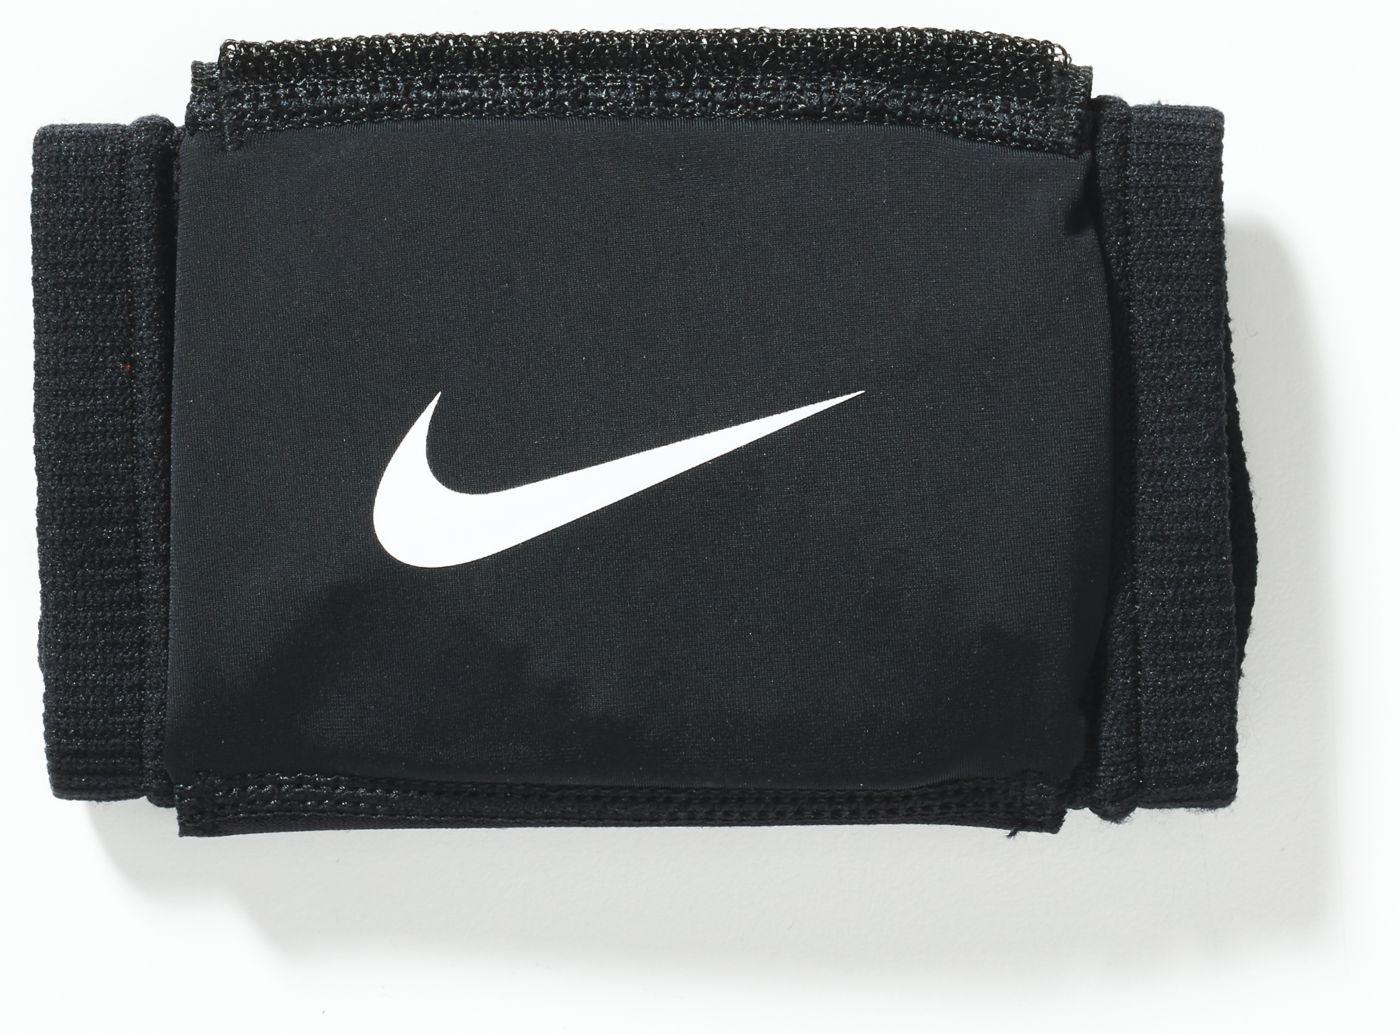 Nike Adult Pro Vapor Padded Wrist Wrap